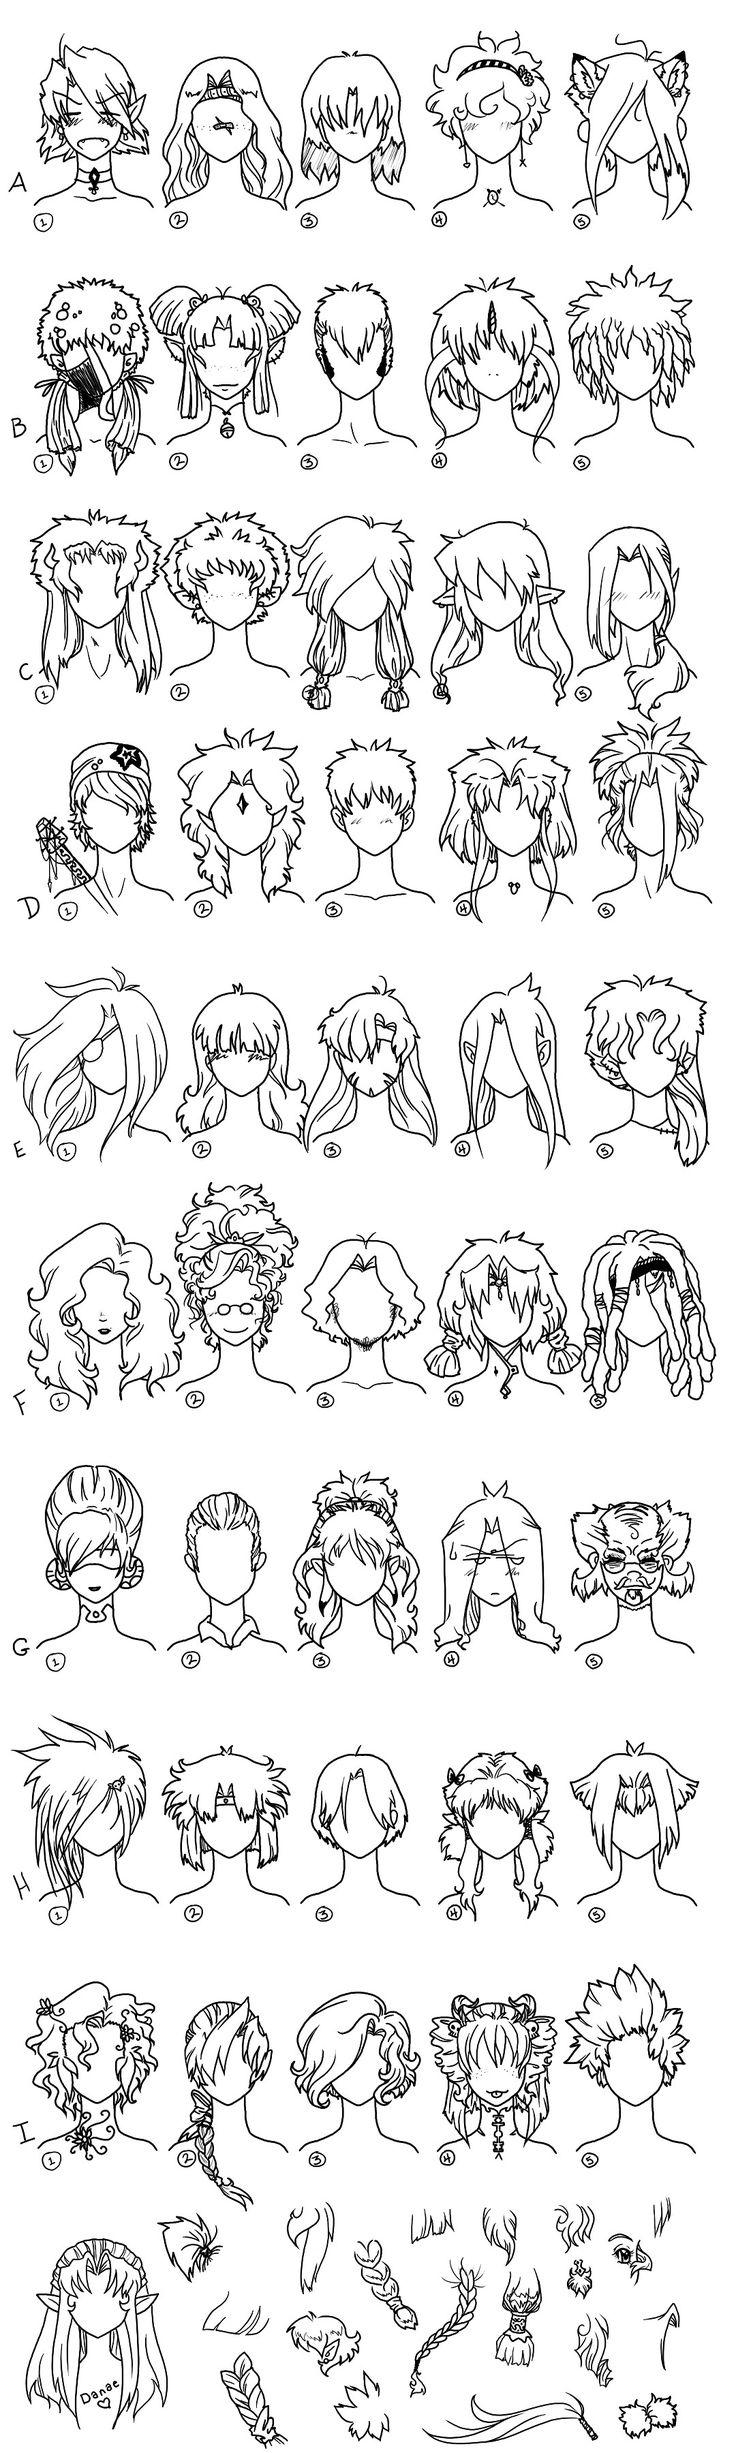 Superb 1000 Ideas About Anime Hair On Pinterest Hair Reference Short Hairstyles For Black Women Fulllsitofus